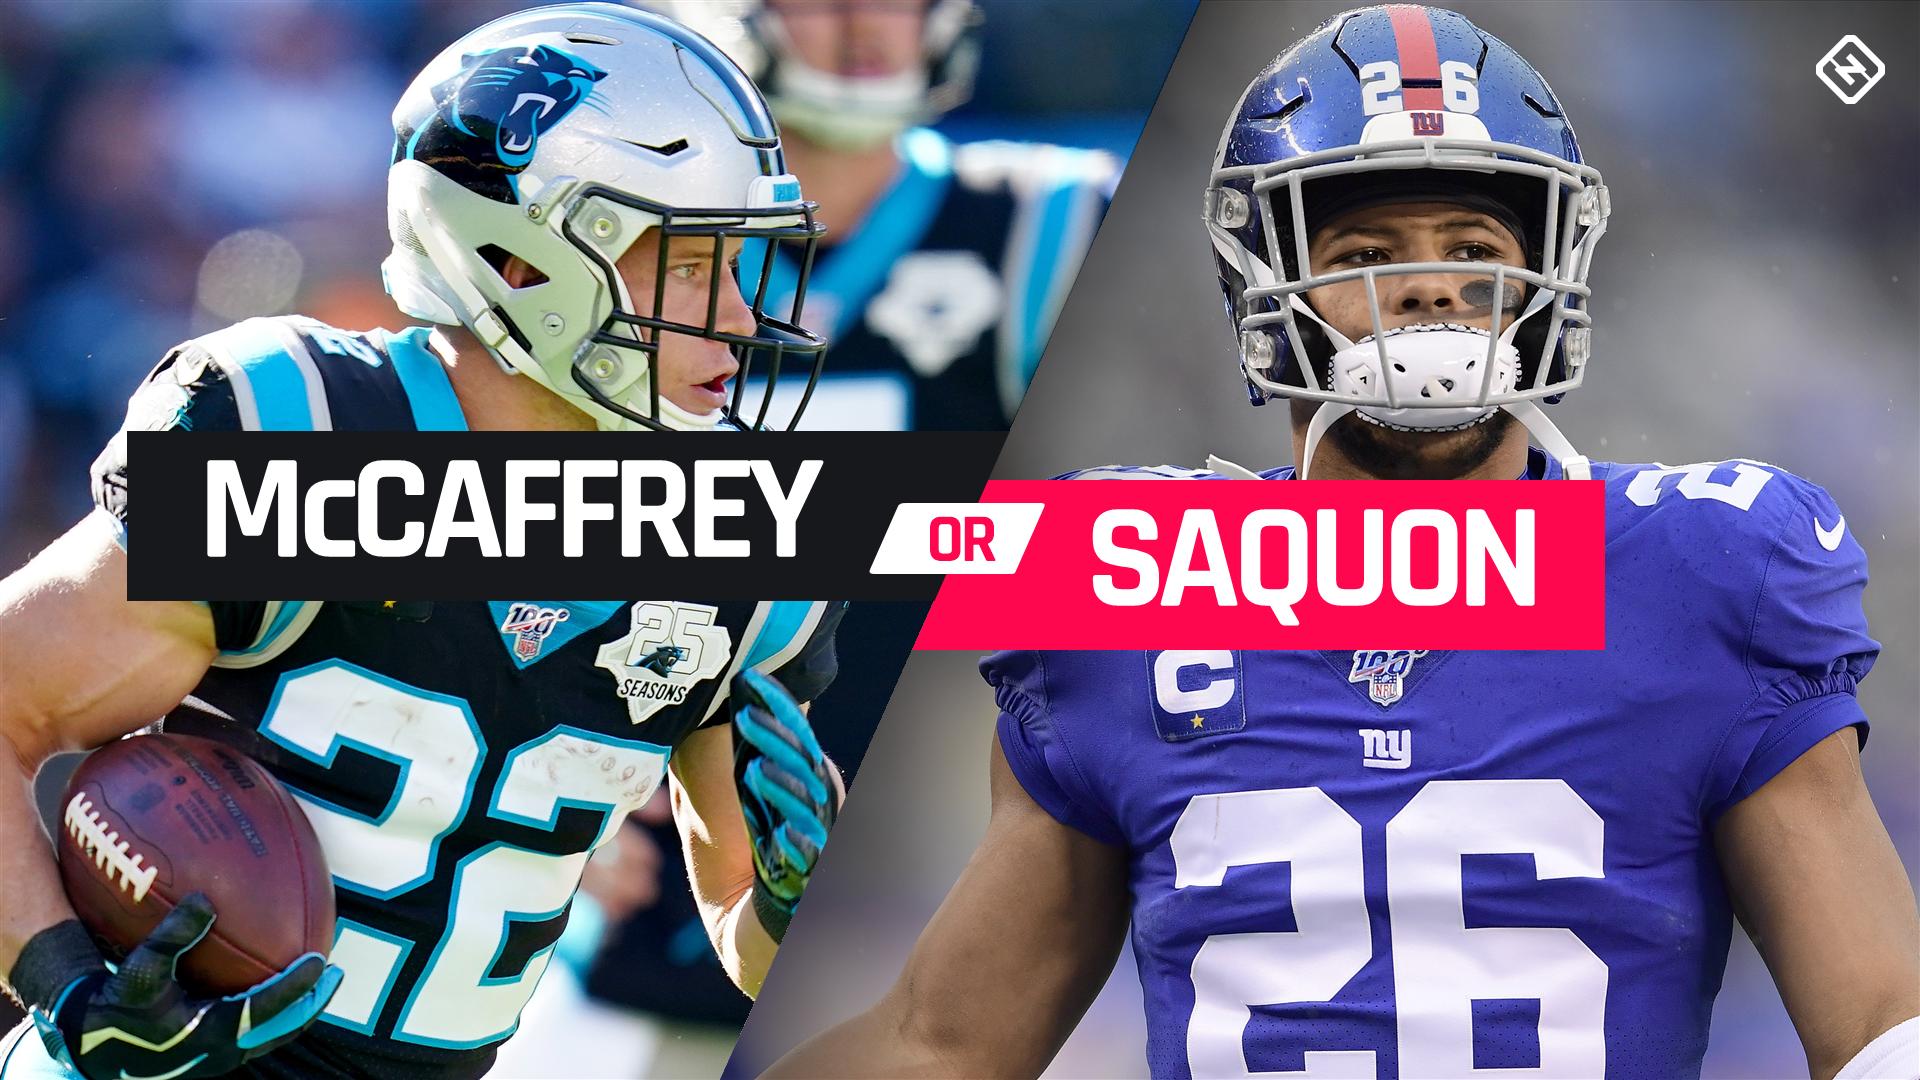 Christian McCaffrey vs. Saquon Barkley: Which top-tier RB should go No. 1 overall in fantasy football?